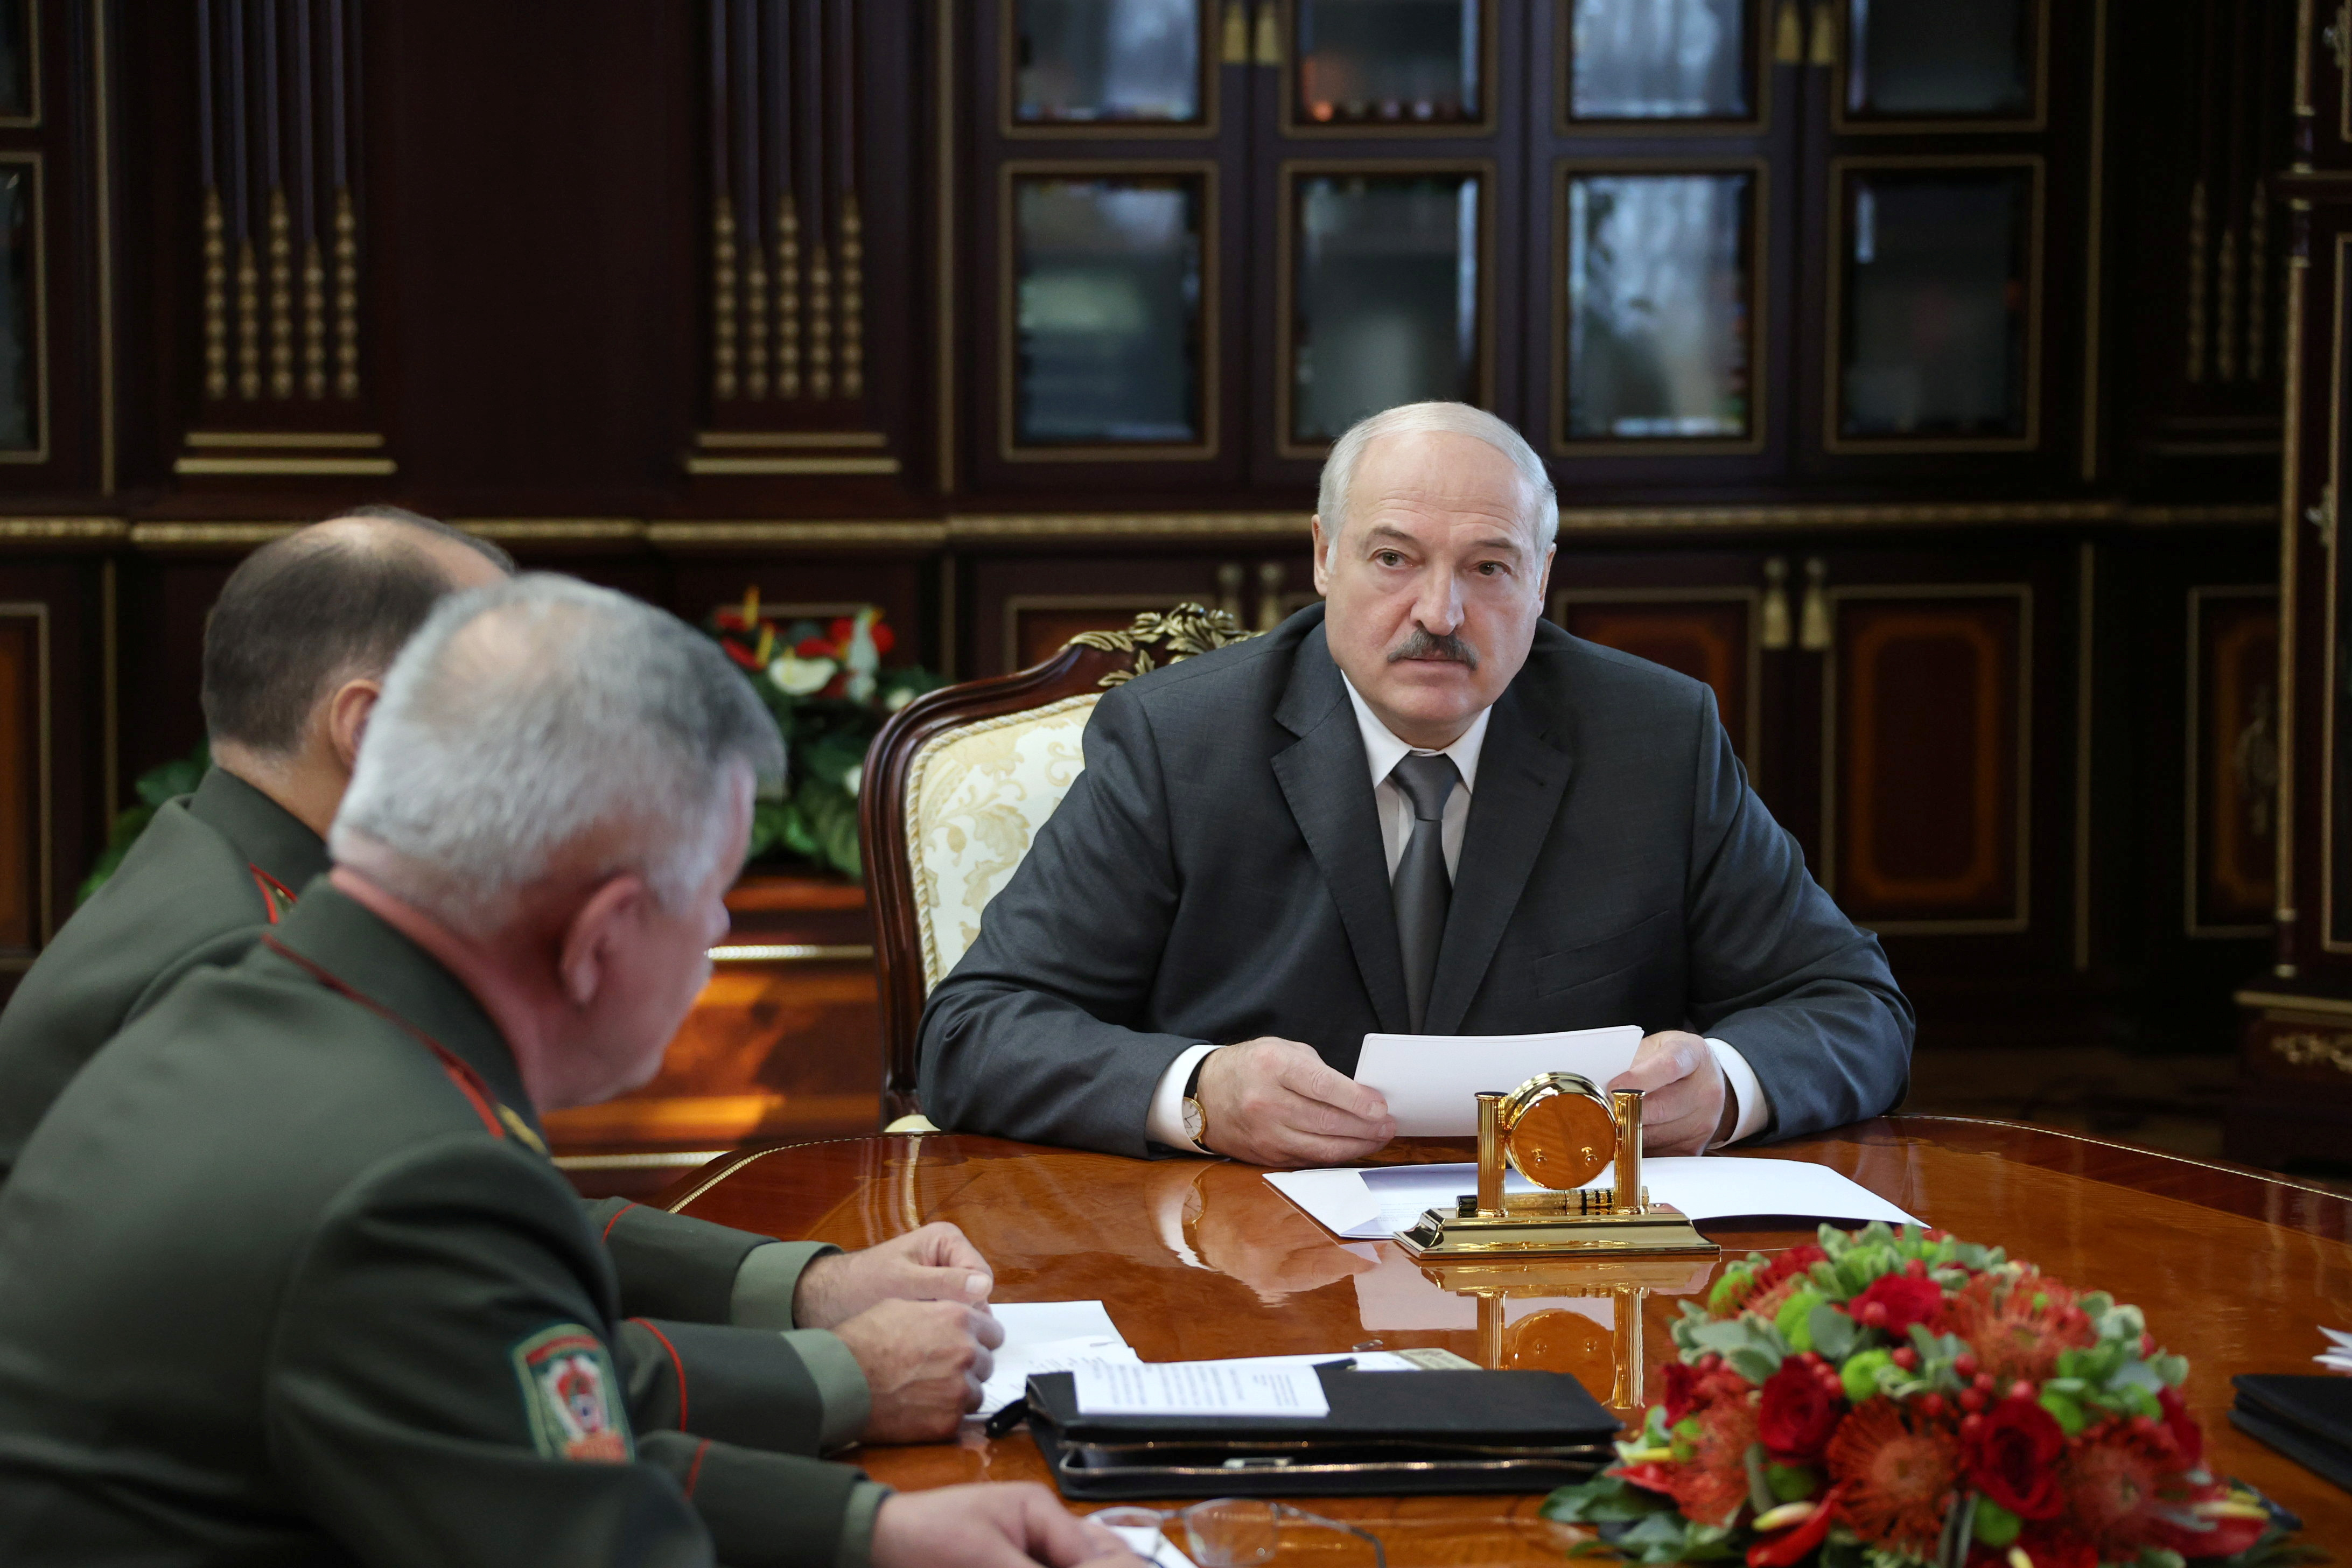 Belarusian President Alexander Lukashenko meets state security officials in Minsk, Belarus September 27, 2021. Maxim Guchek/BelTA/Handout via REUTERS